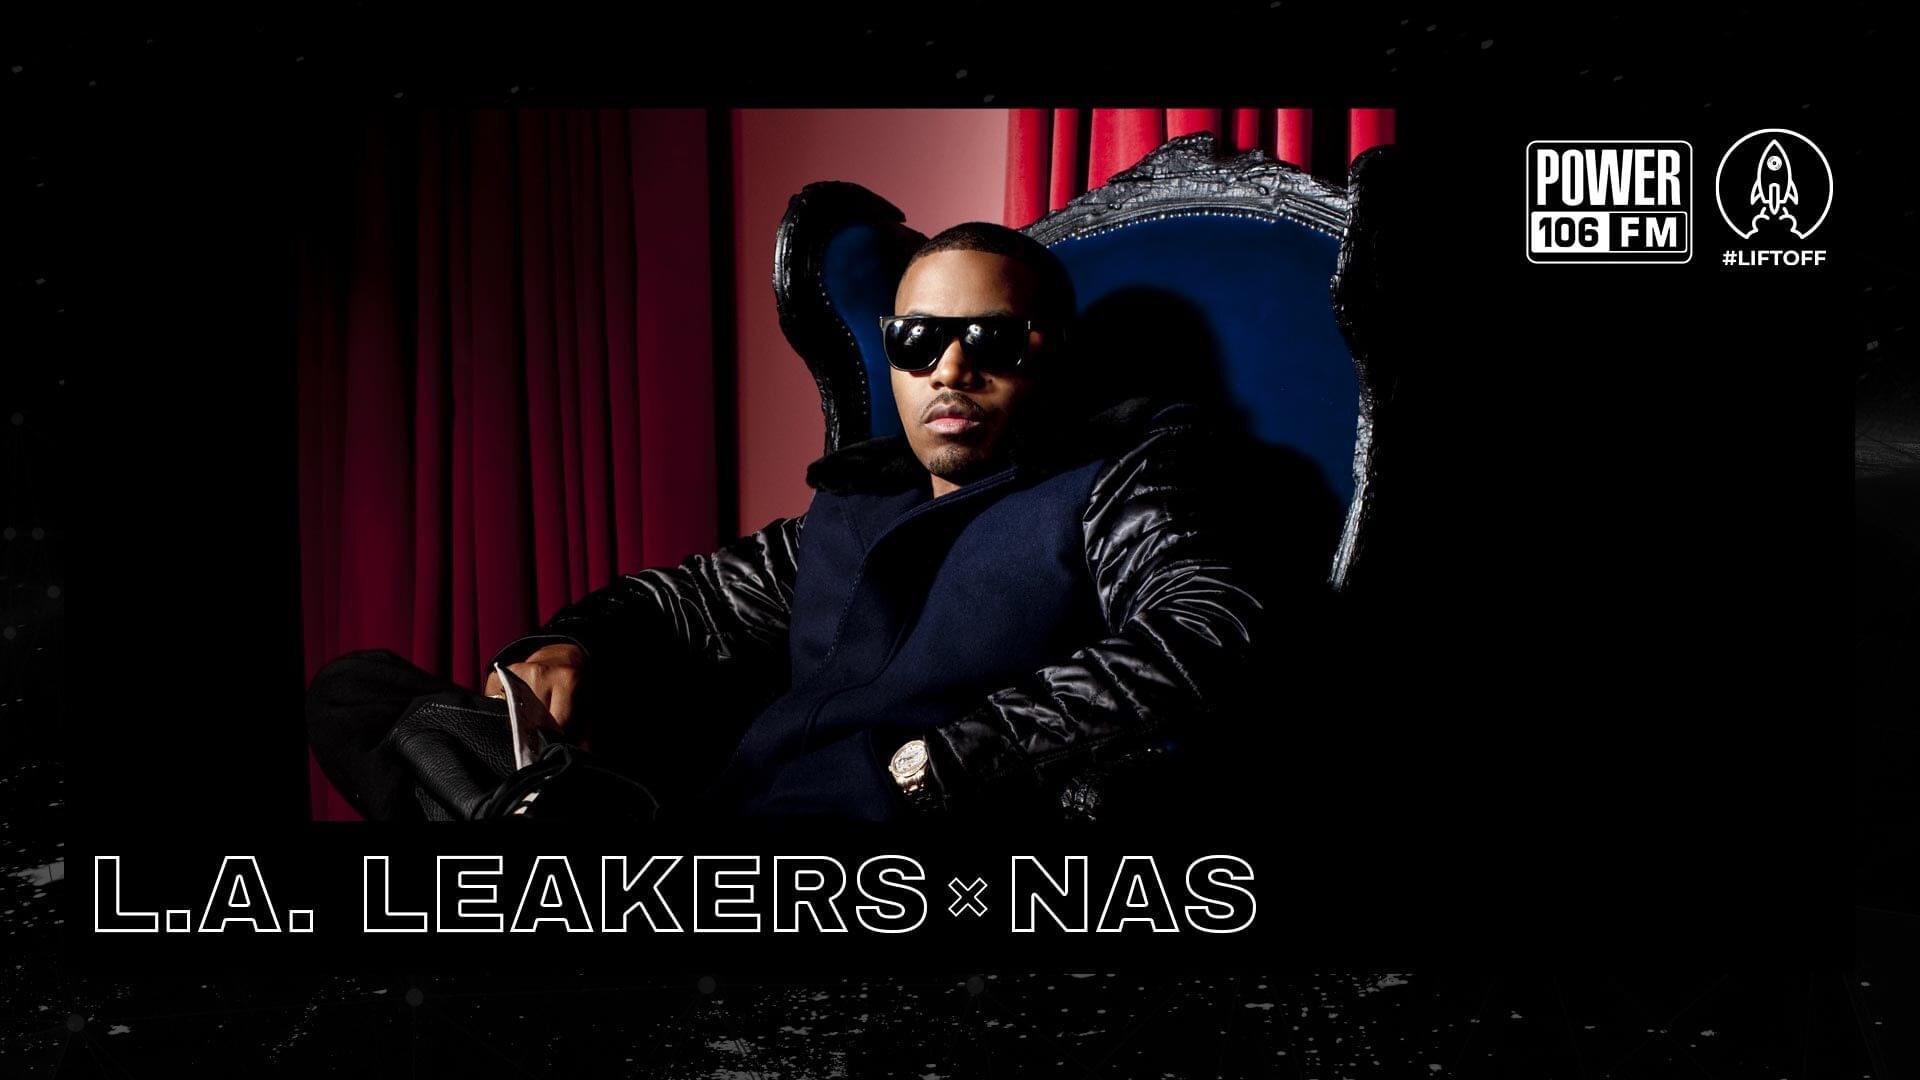 Nas Meant No Disrespect w/Doja Cat Lyric + Hit-Boy Talks Juice WRLD Inspiration On 'King's Disease'